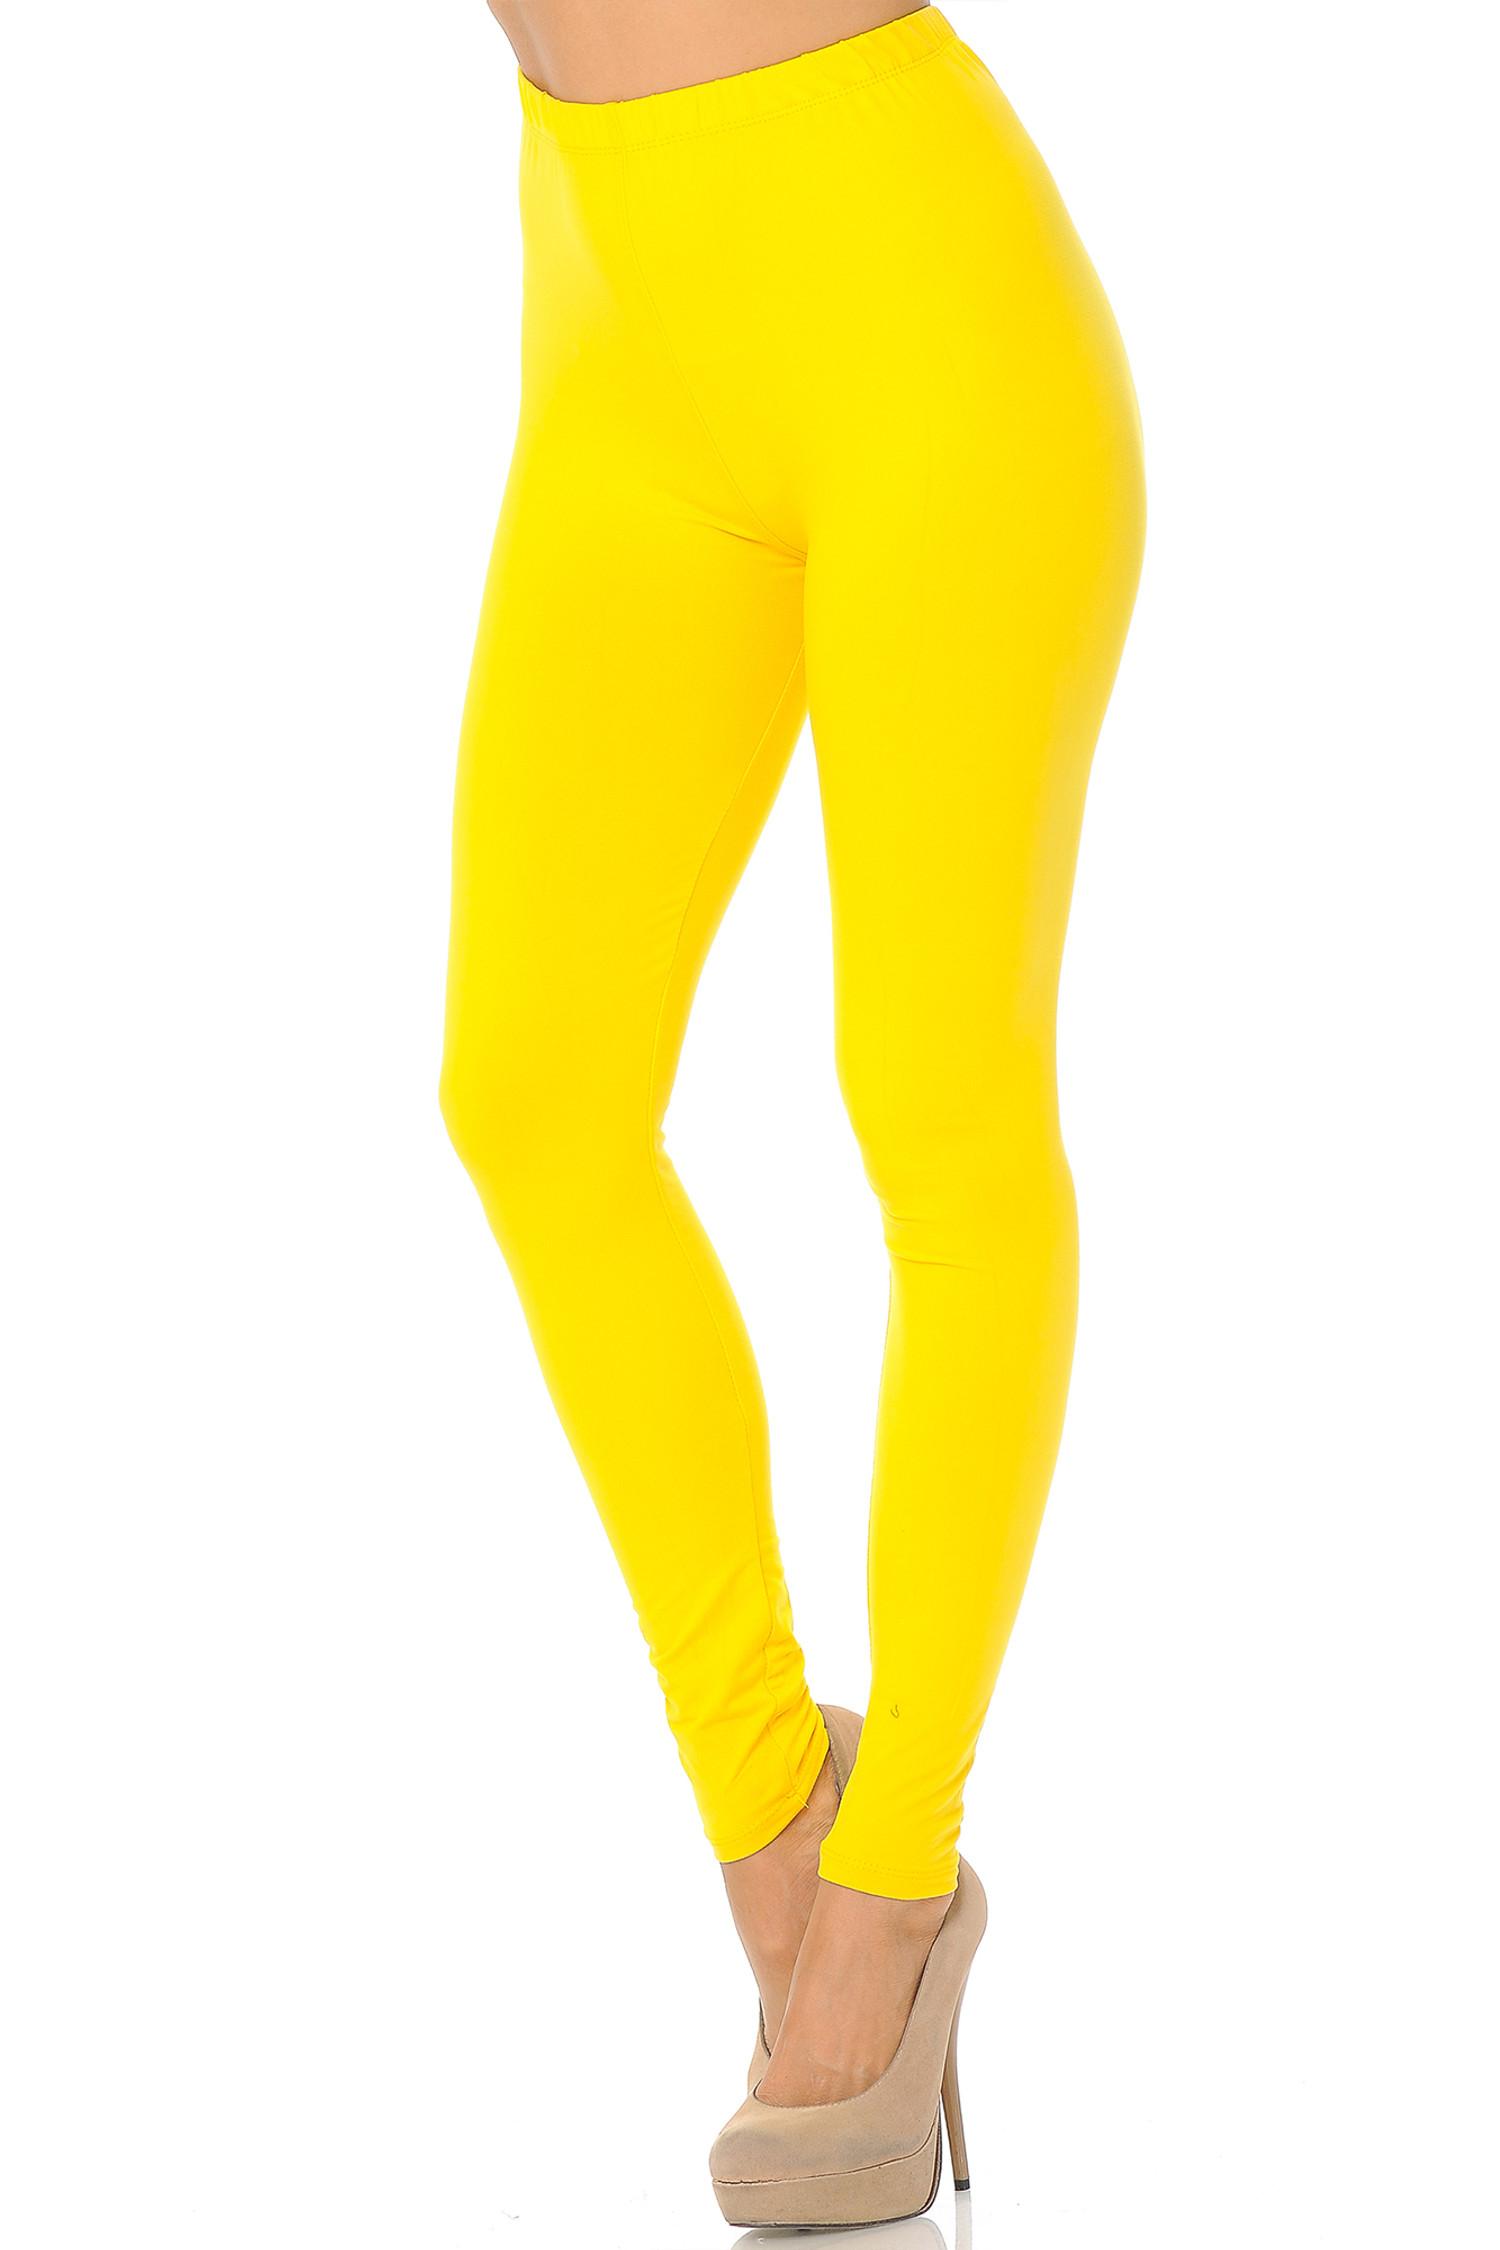 Yellow Brushed Basic Solid Leggings - EEVEE